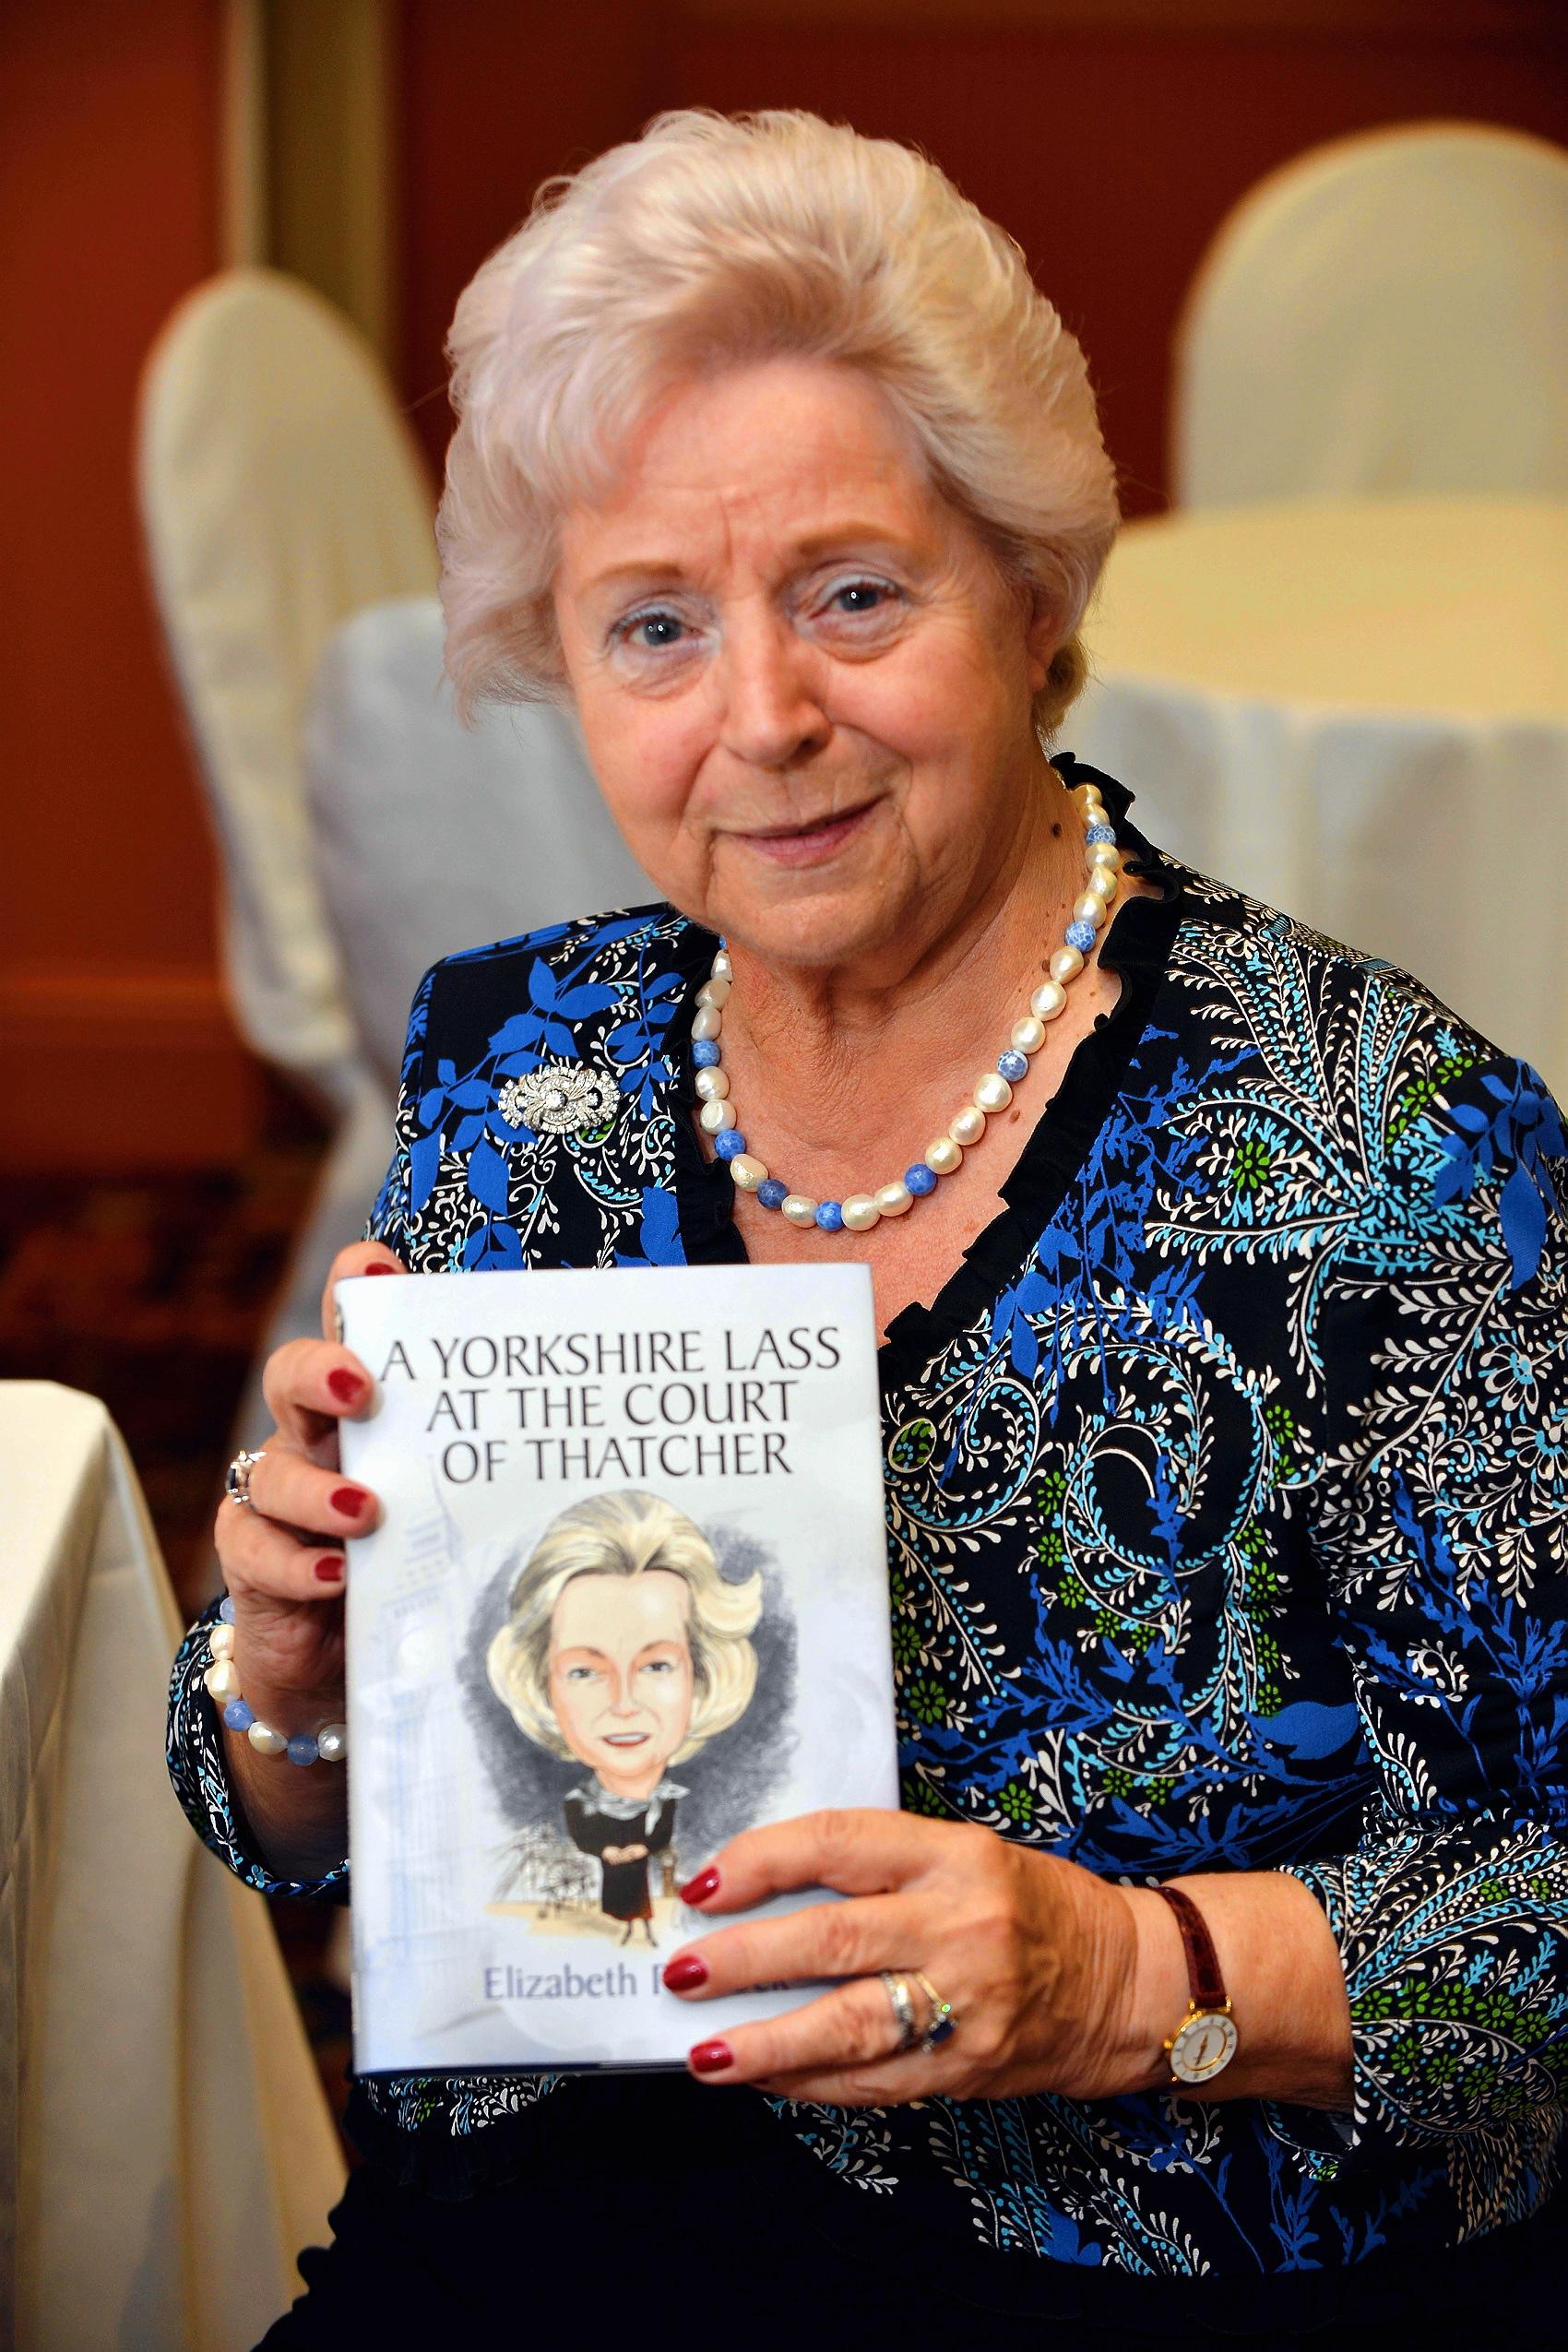 Elizabeth Peacock Book launch for former MP Elizabeth Peacock From Bradford Telegraph